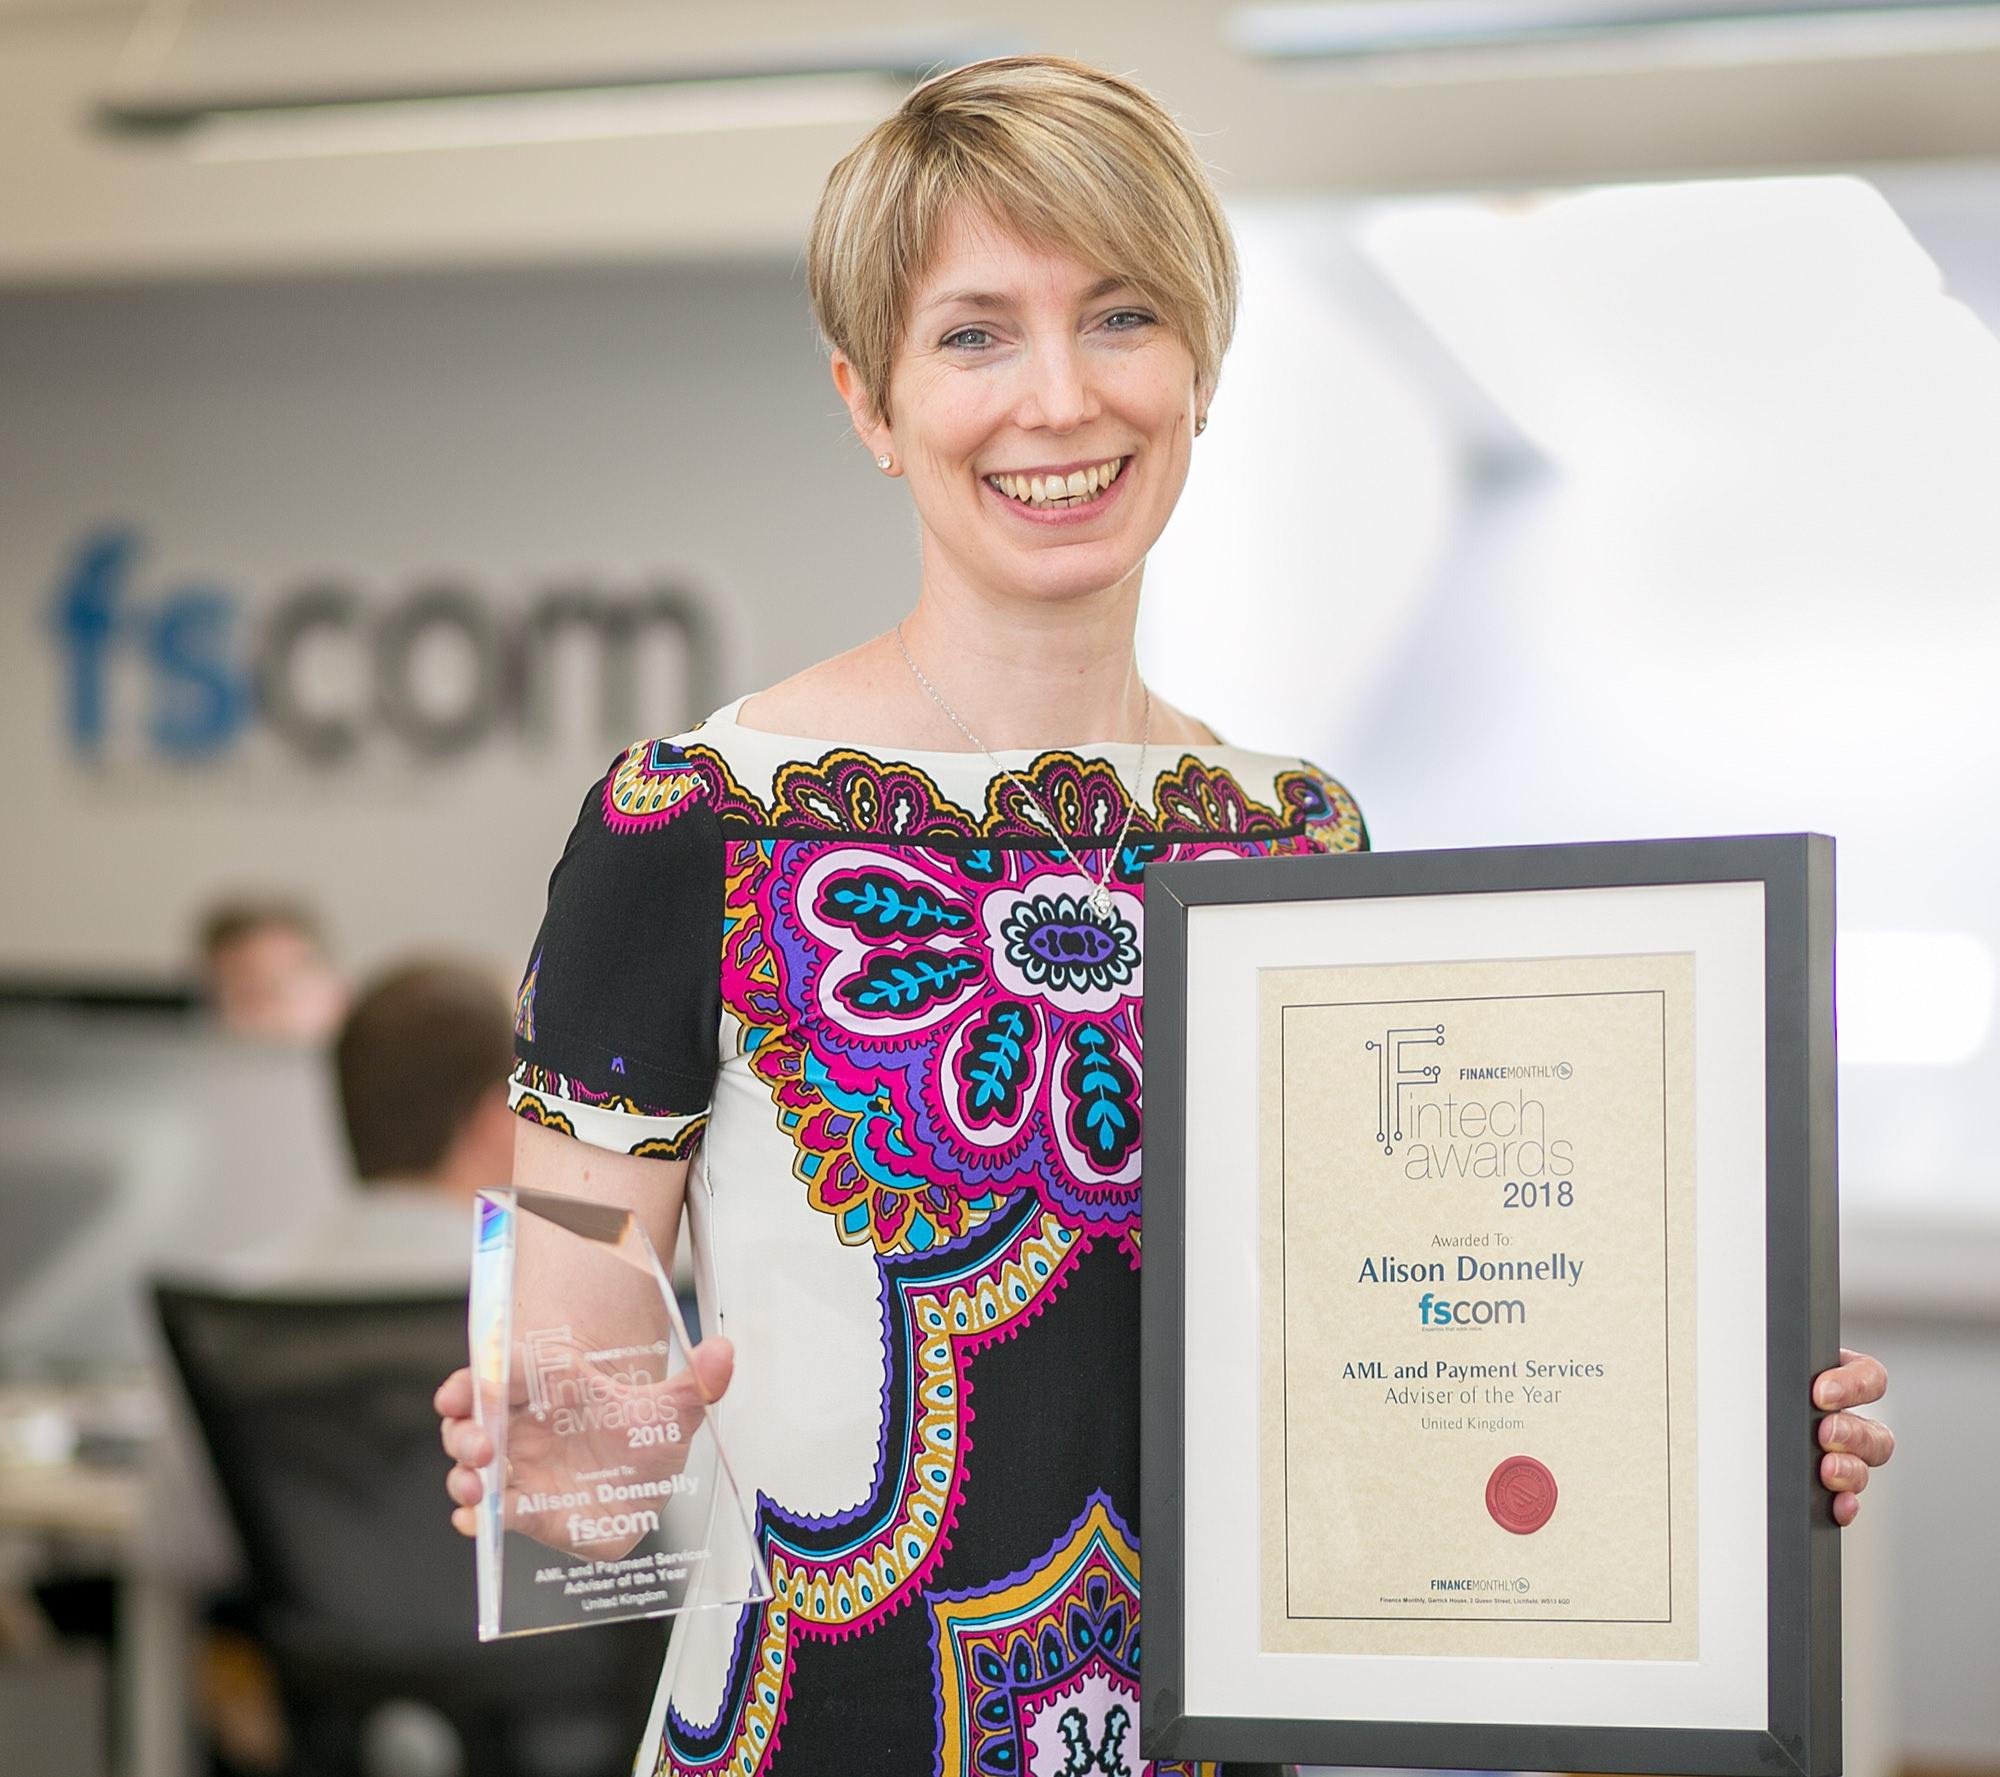 fscom director Alison Donnely scoops awards